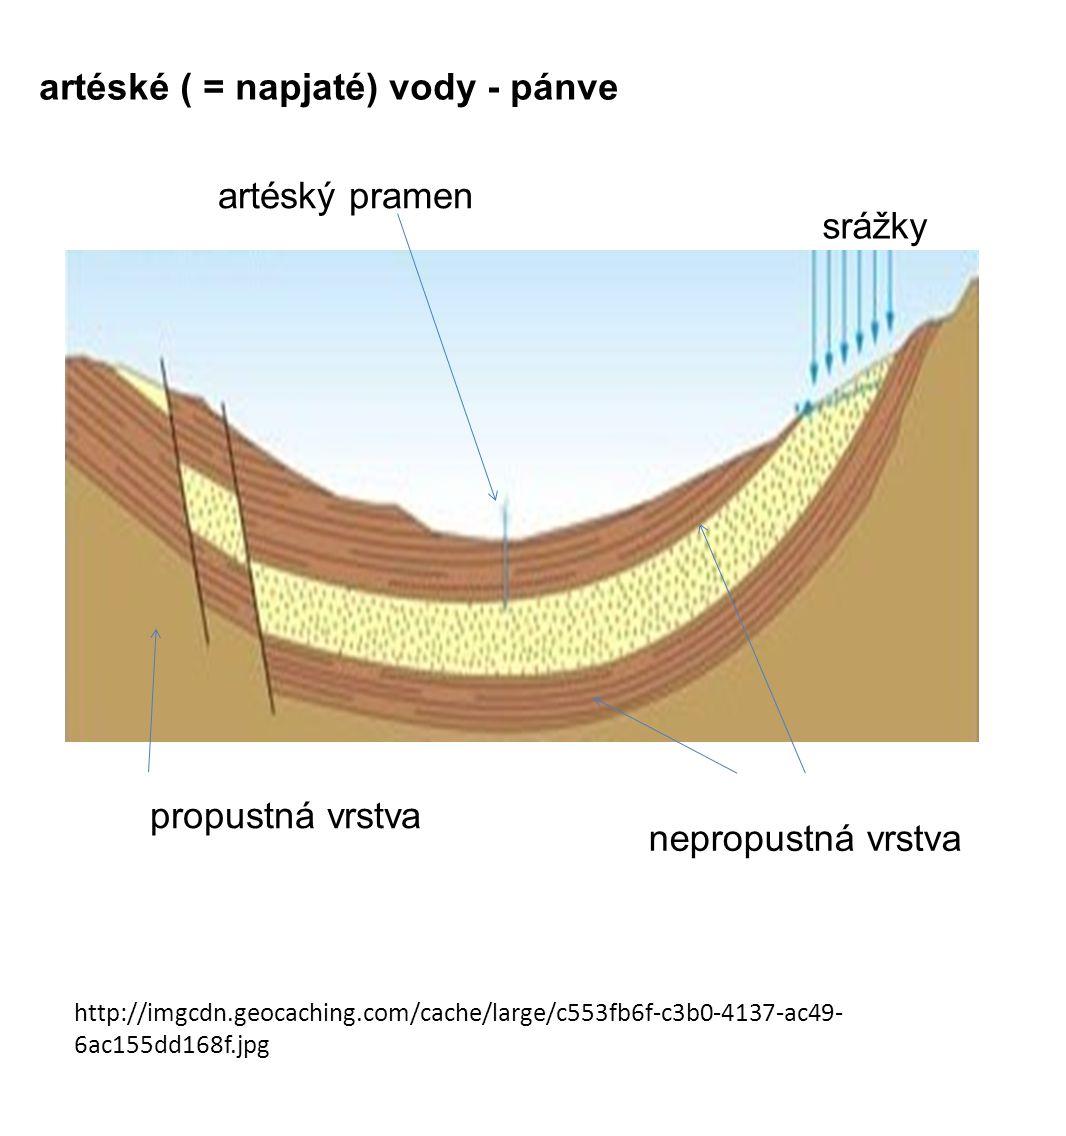 http://imgcdn.geocaching.com/cache/large/c553fb6f-c3b0-4137-ac49- 6ac155dd168f.jpg artéské ( = napjaté) vody - pánve srážky propustná vrstva nepropust